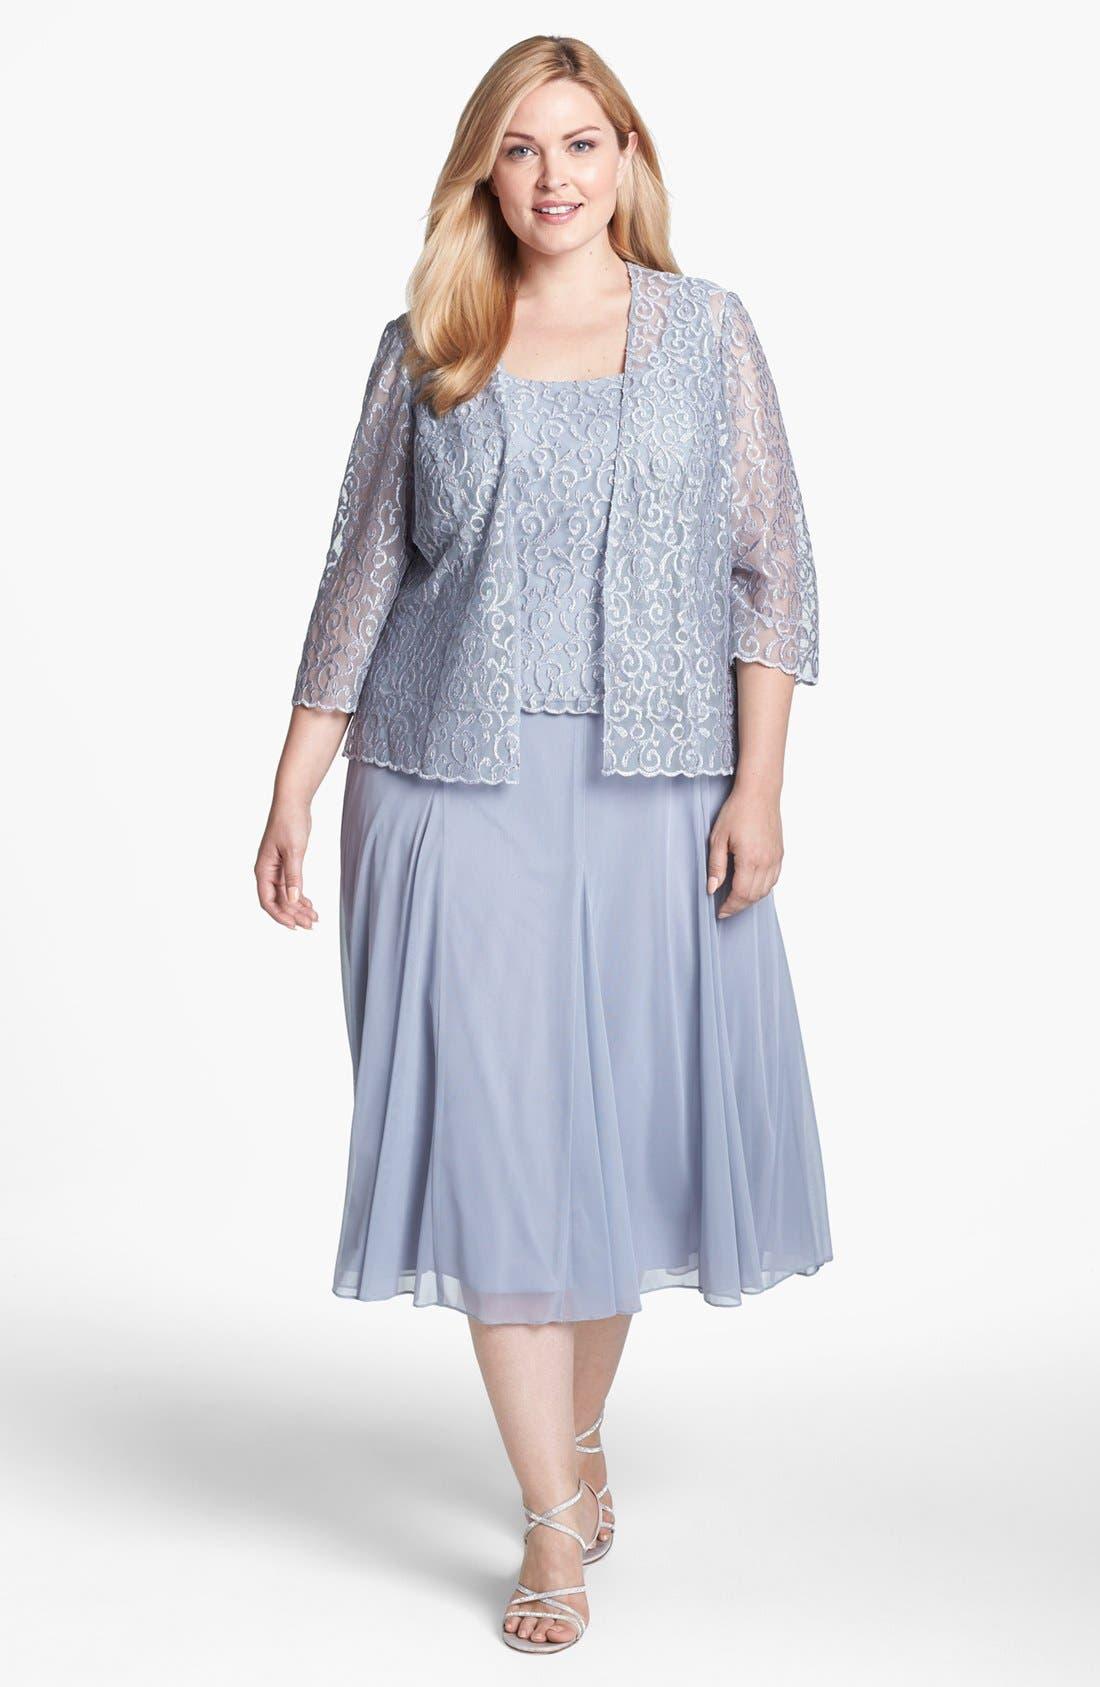 Alternate Image 1 Selected - Alex Evenings Mixed Media Dress & Jacket (Plus Size)